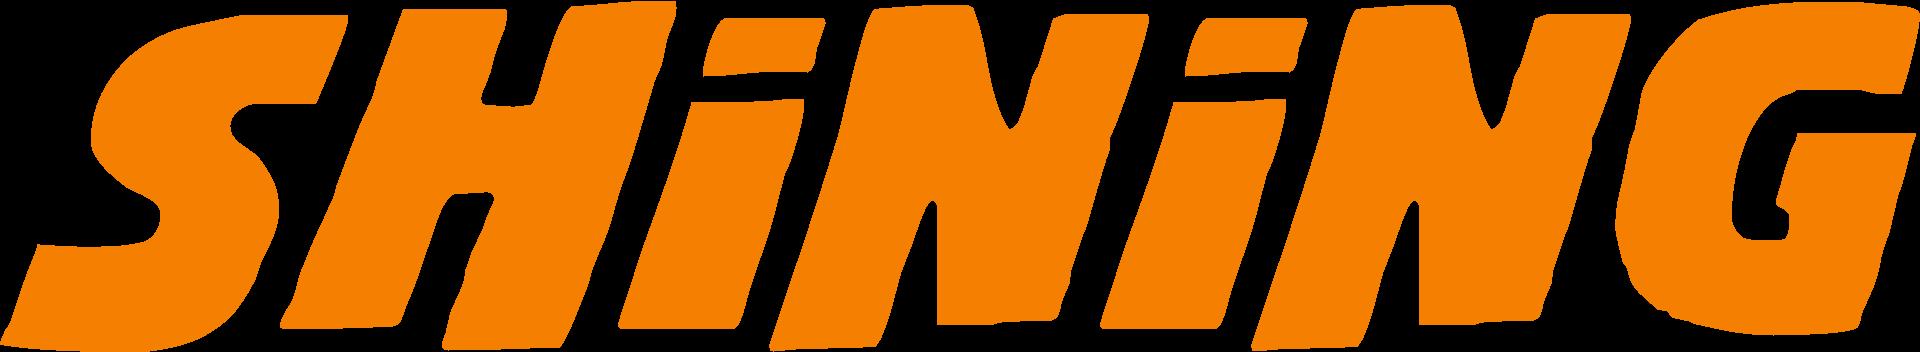 The Shining Font